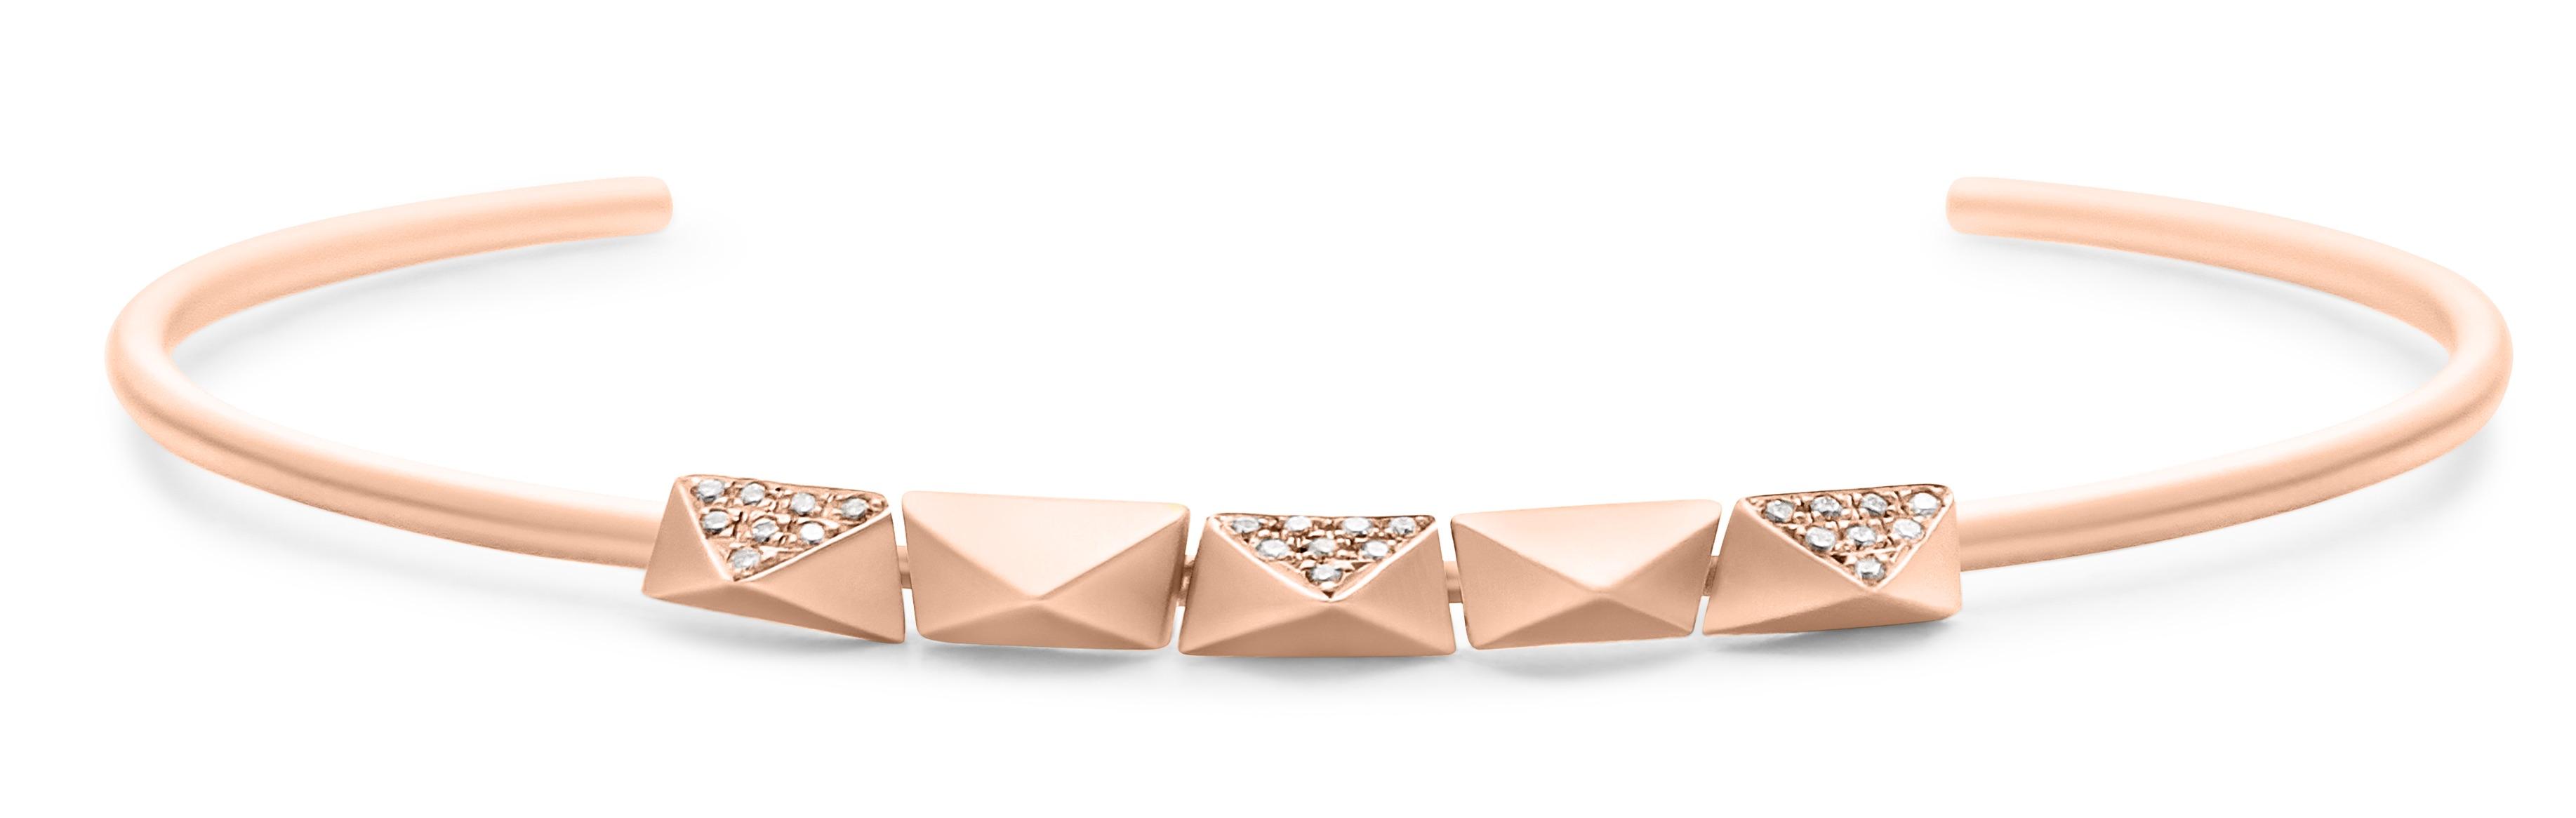 Dana Bronfman 5 Pi cuff bracelet | JCK On Your Market